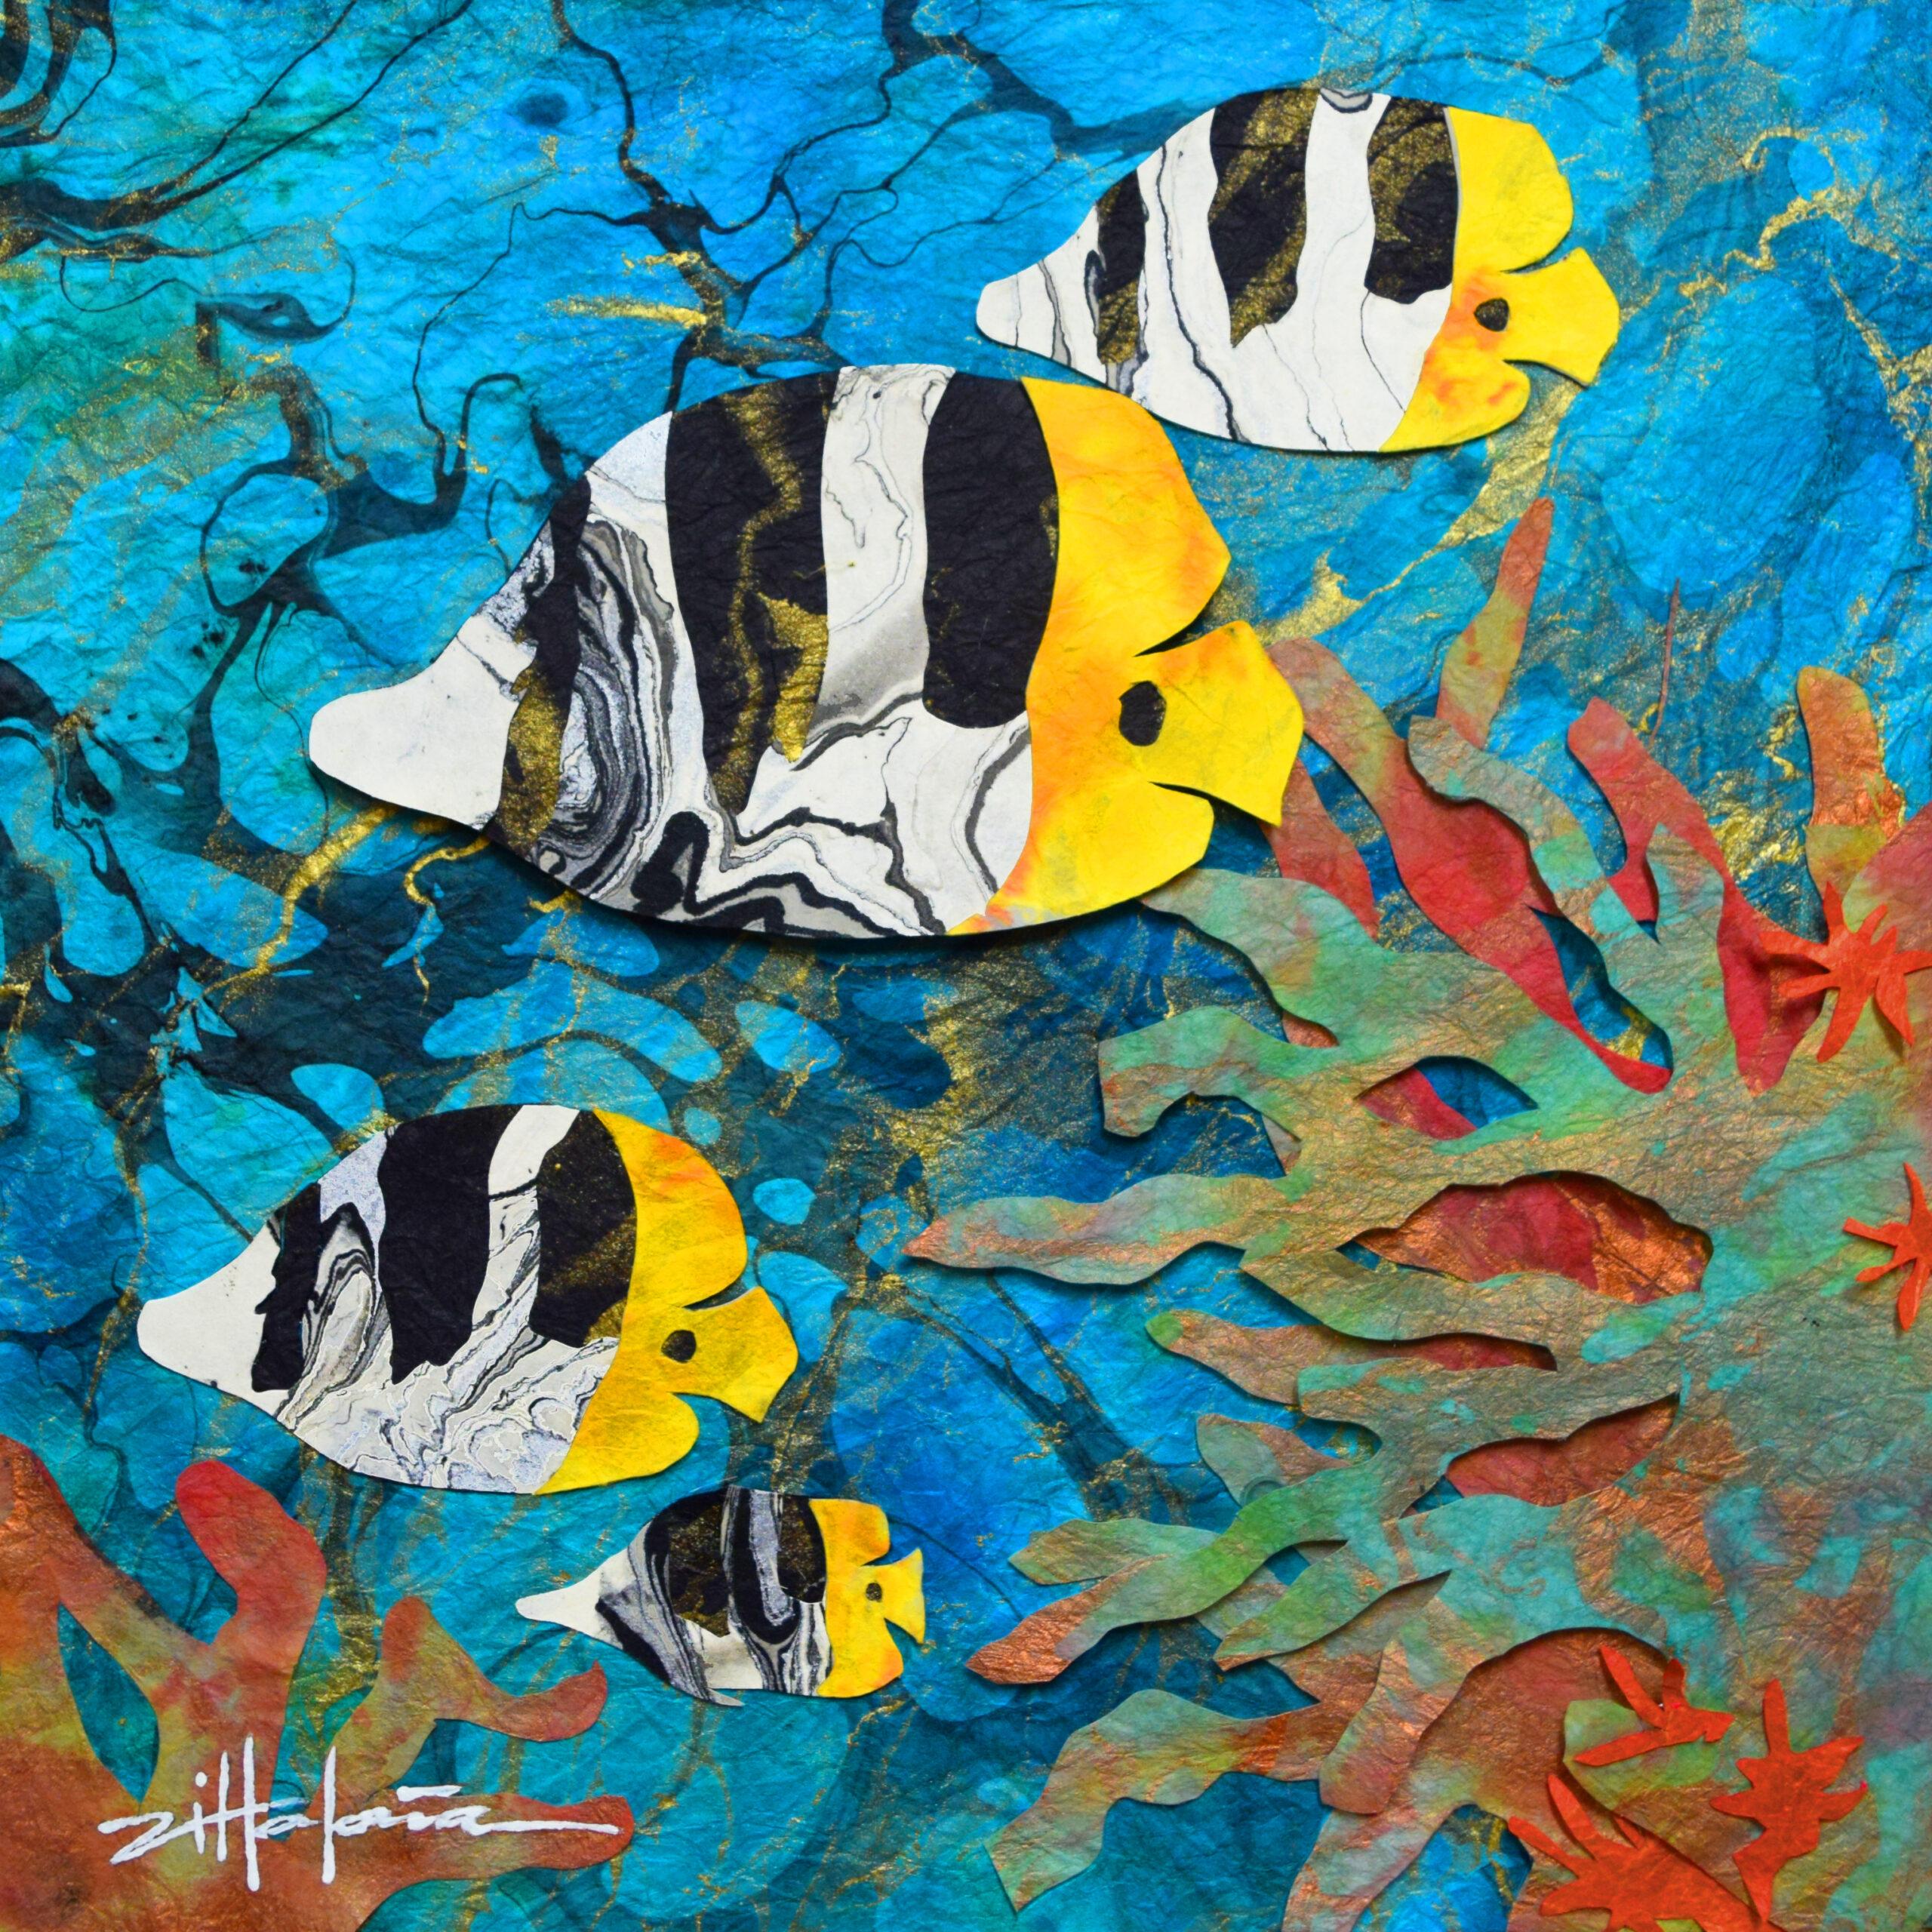 Even Butterflies Swim - Ocean Butterflies by Marcy Ann Villafana